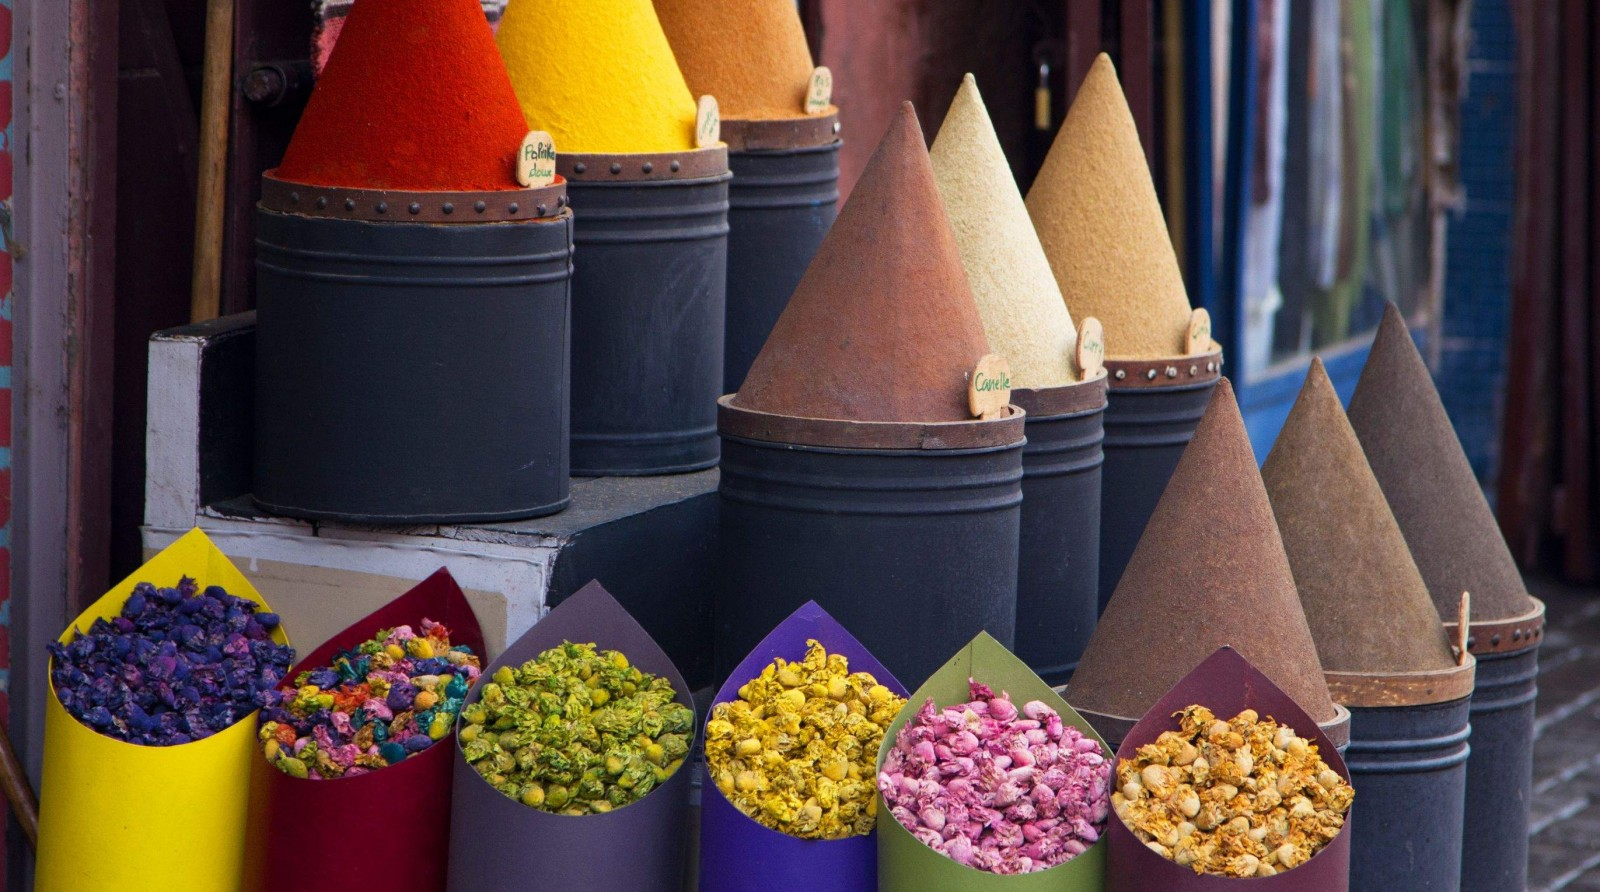 morocco spice and flower market | mosaic art retreats